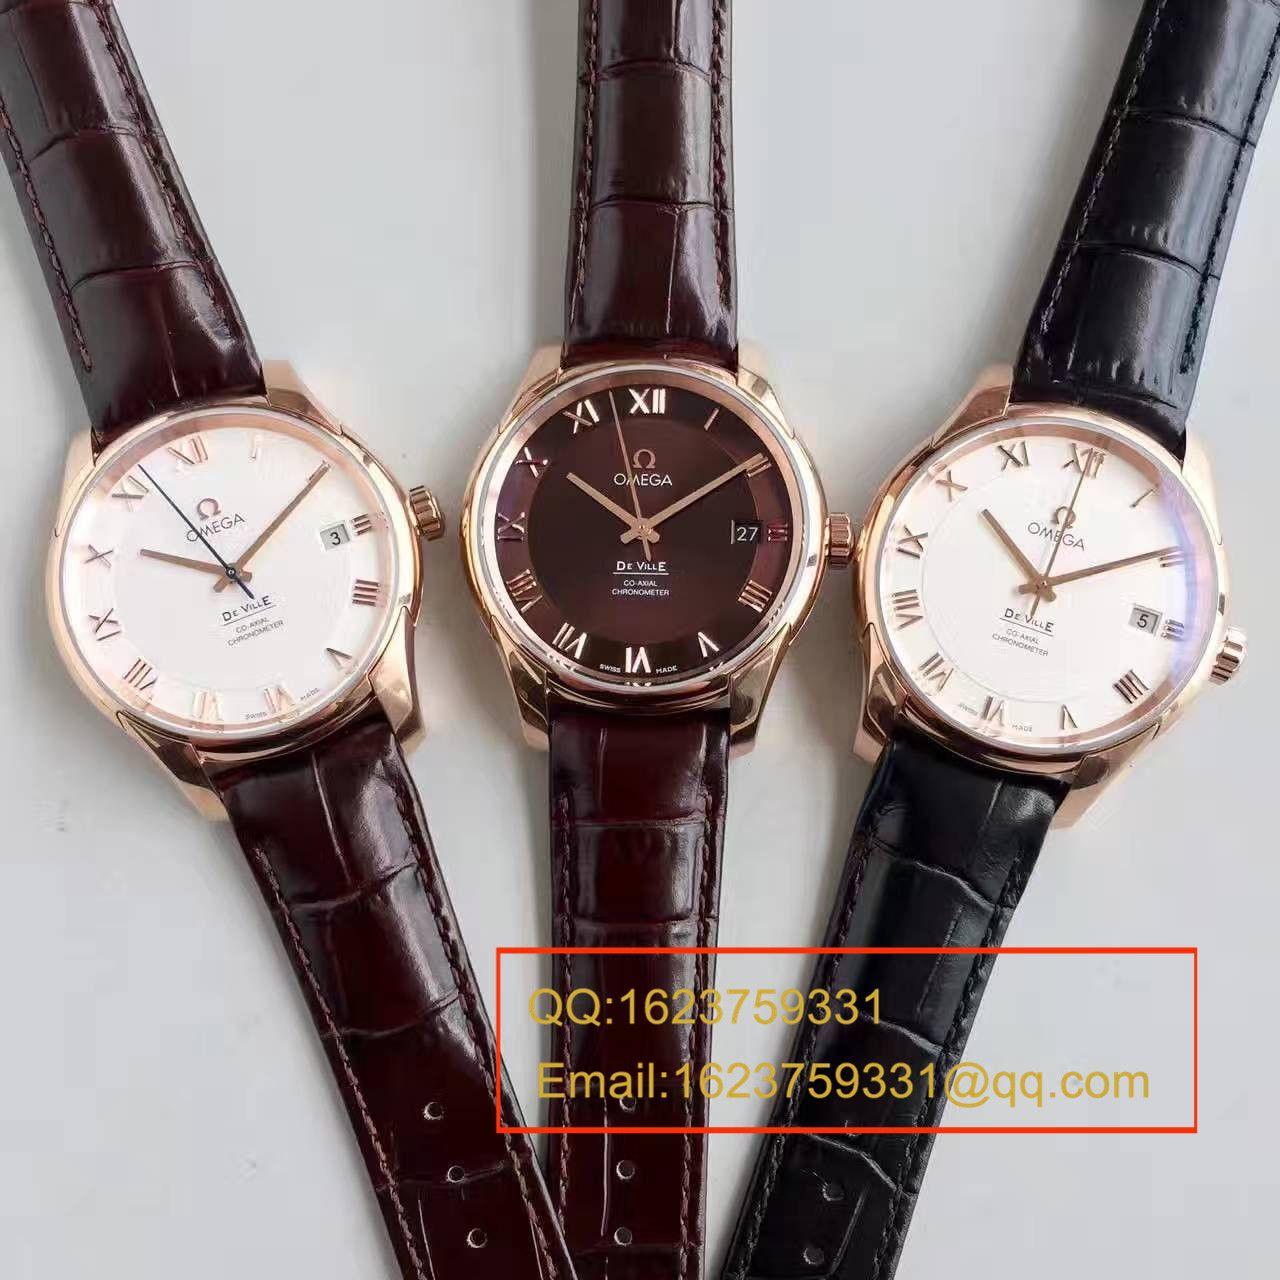 【SSS厂顶级1:1复刻手表】欧米茄碟飞系列431.10.41.21.02.001腕表